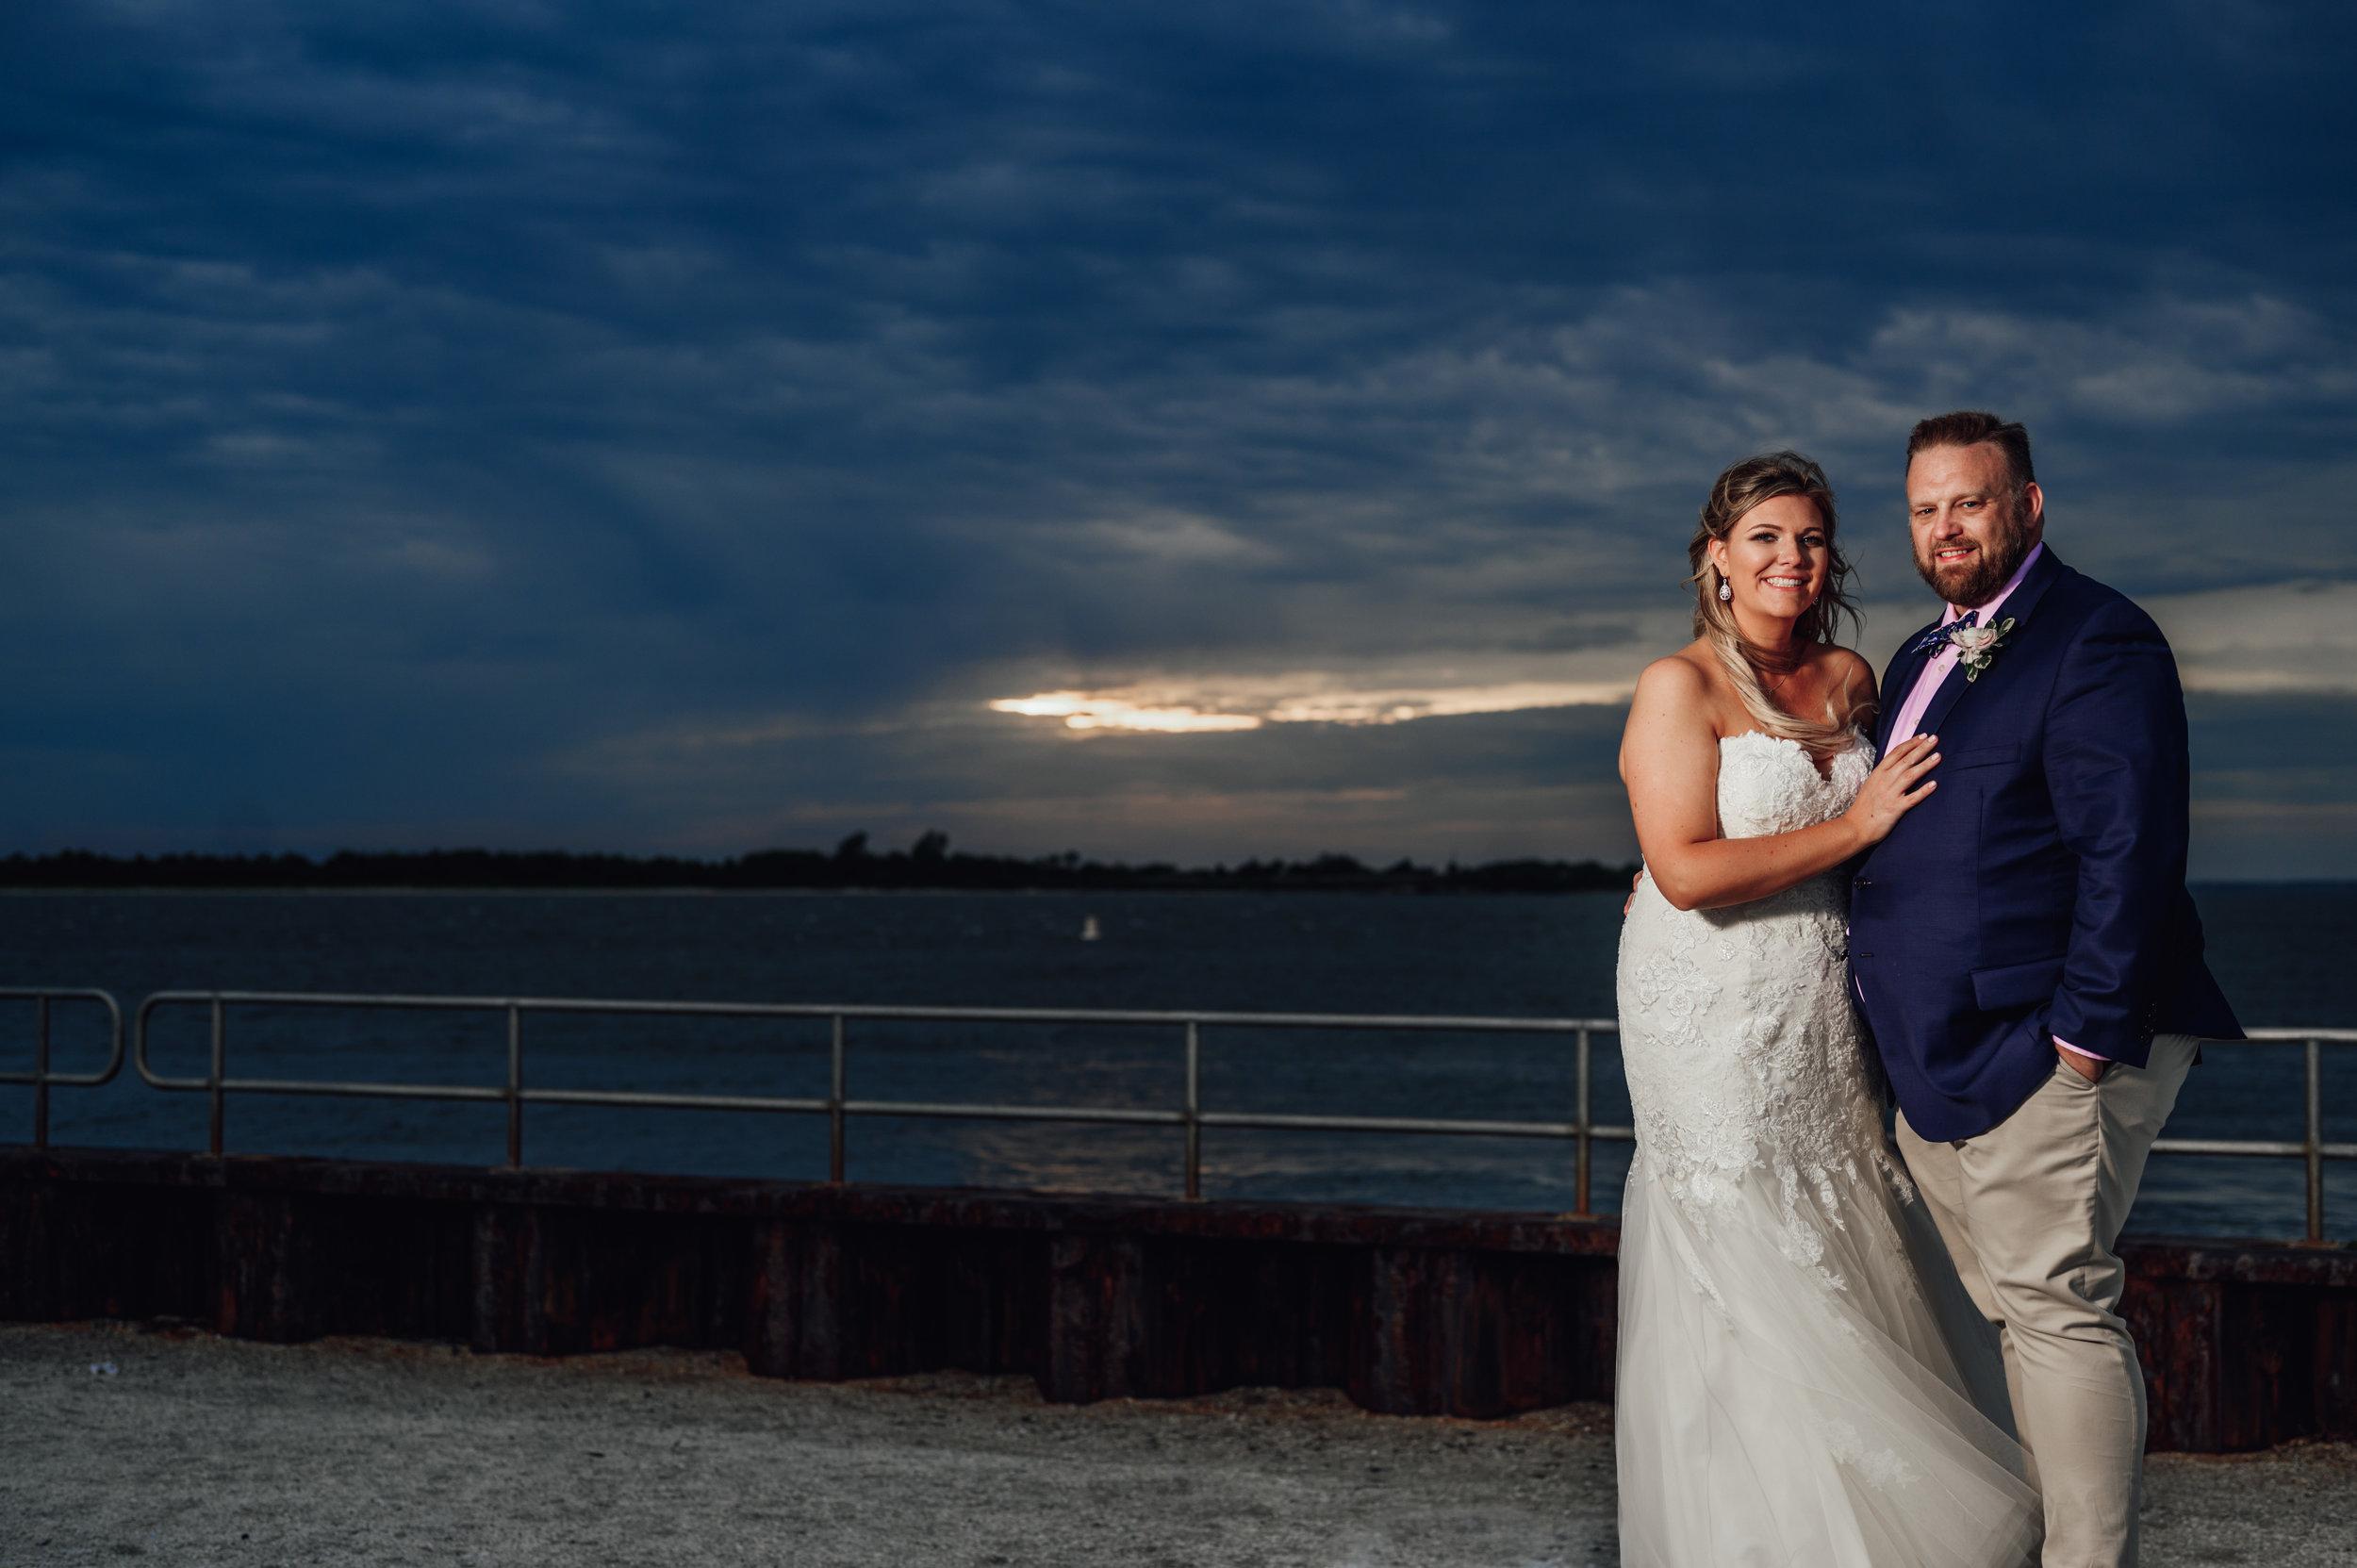 New Jersey Wedding Photographer, Felsberg Photography LBI wedding photography 115.jpg